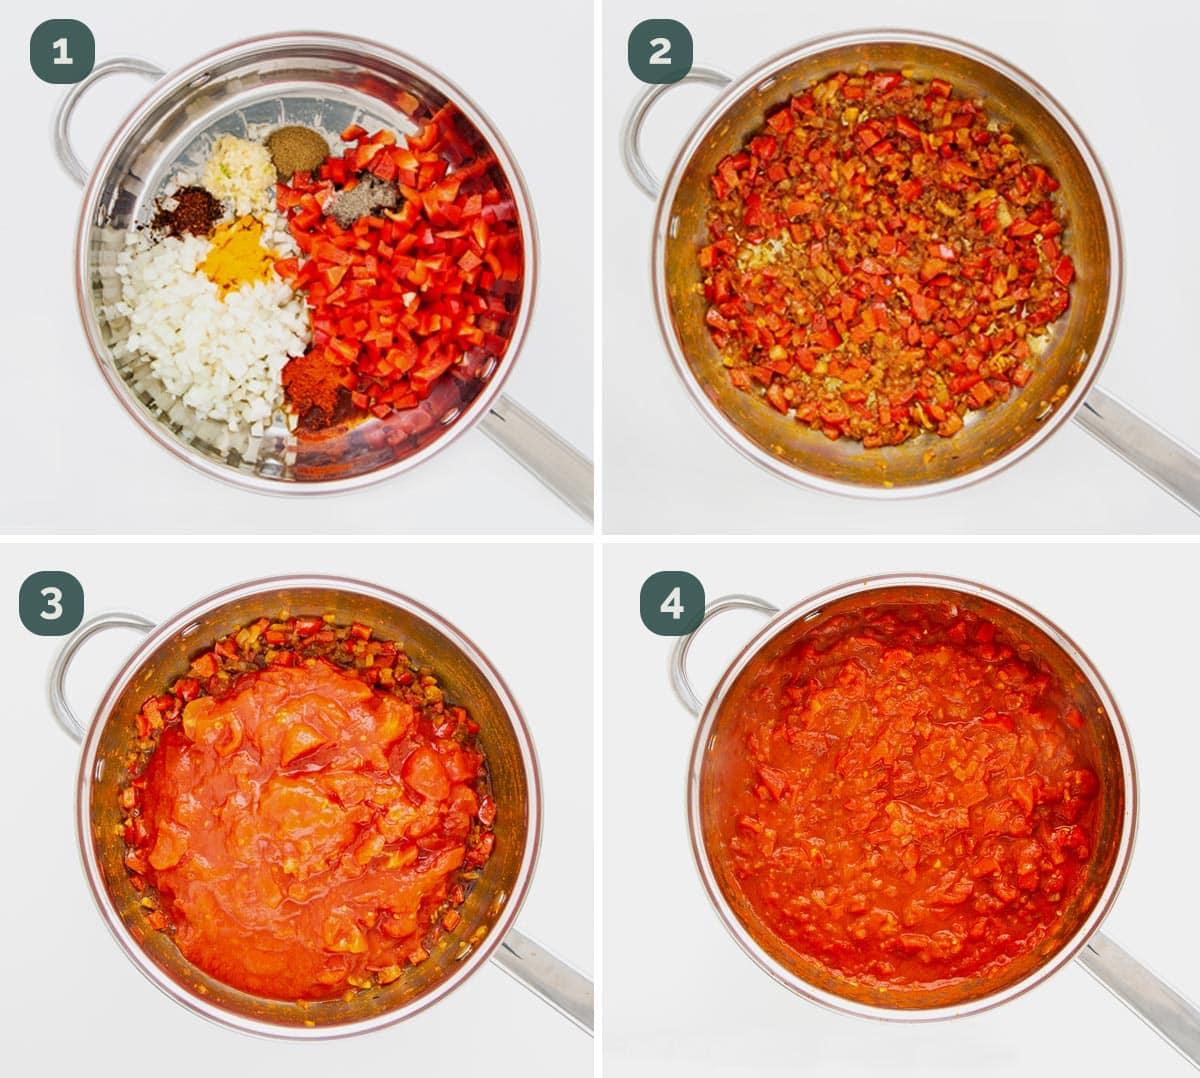 process shots showing how to make sauce for shakshuka.